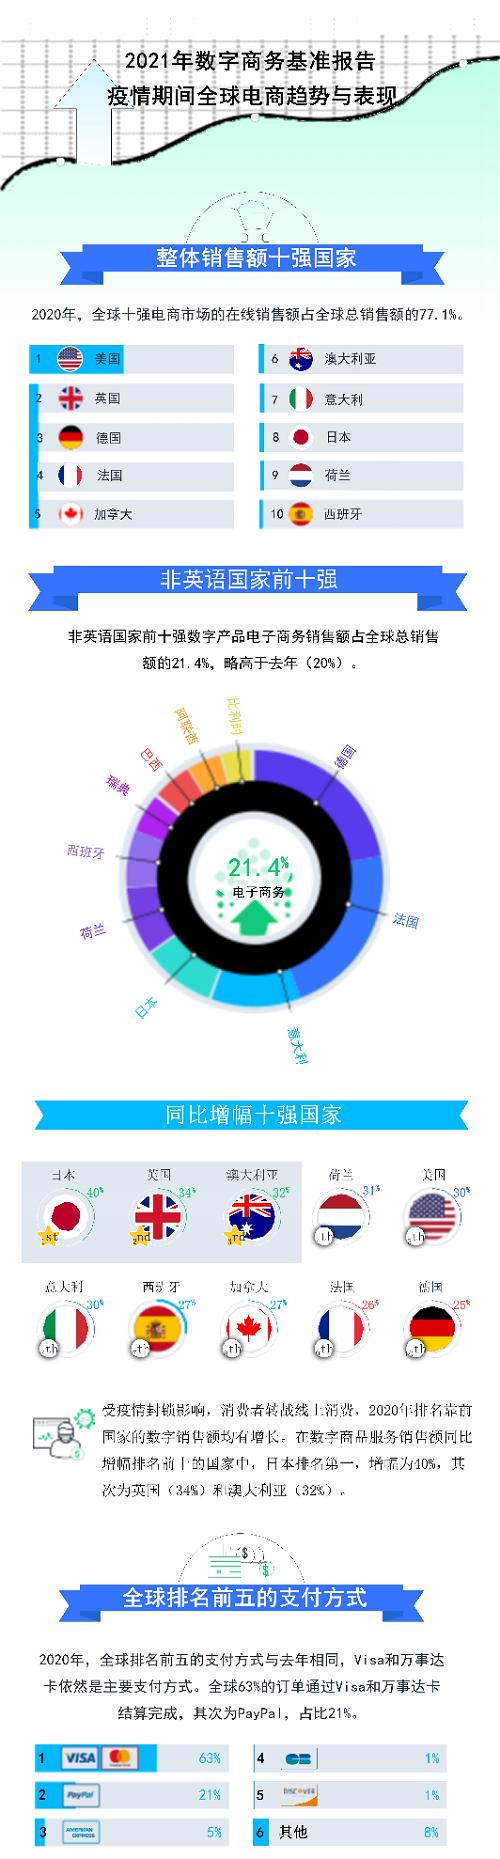 2Checkout发布2020年全球数字商务基准研究报告